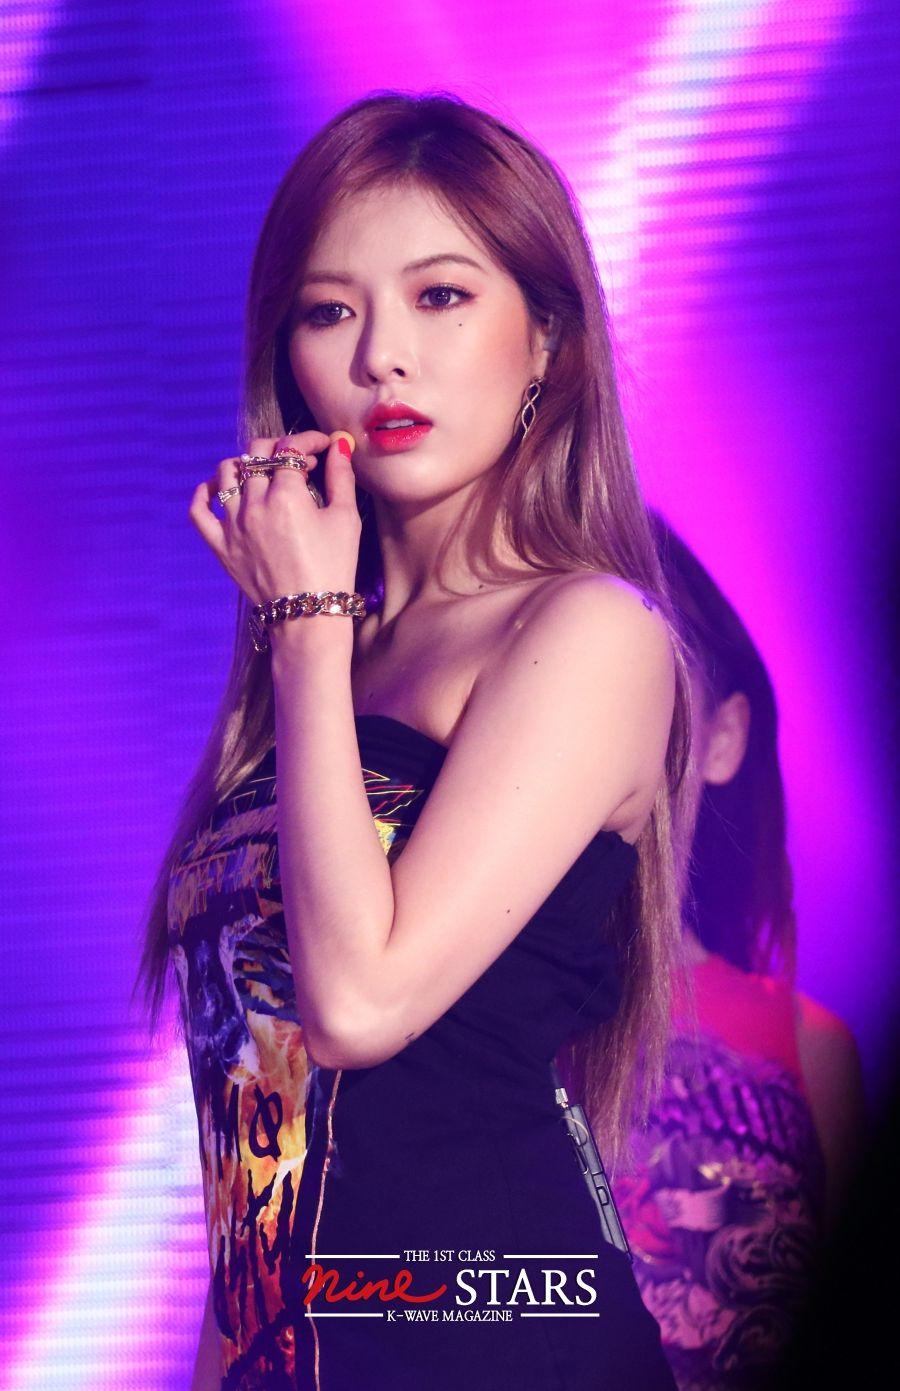 Pin By Lydia Everdale On Kim Hyuna Stage Performances Kpop Girls Hyuna Kim Wonder Girls Members